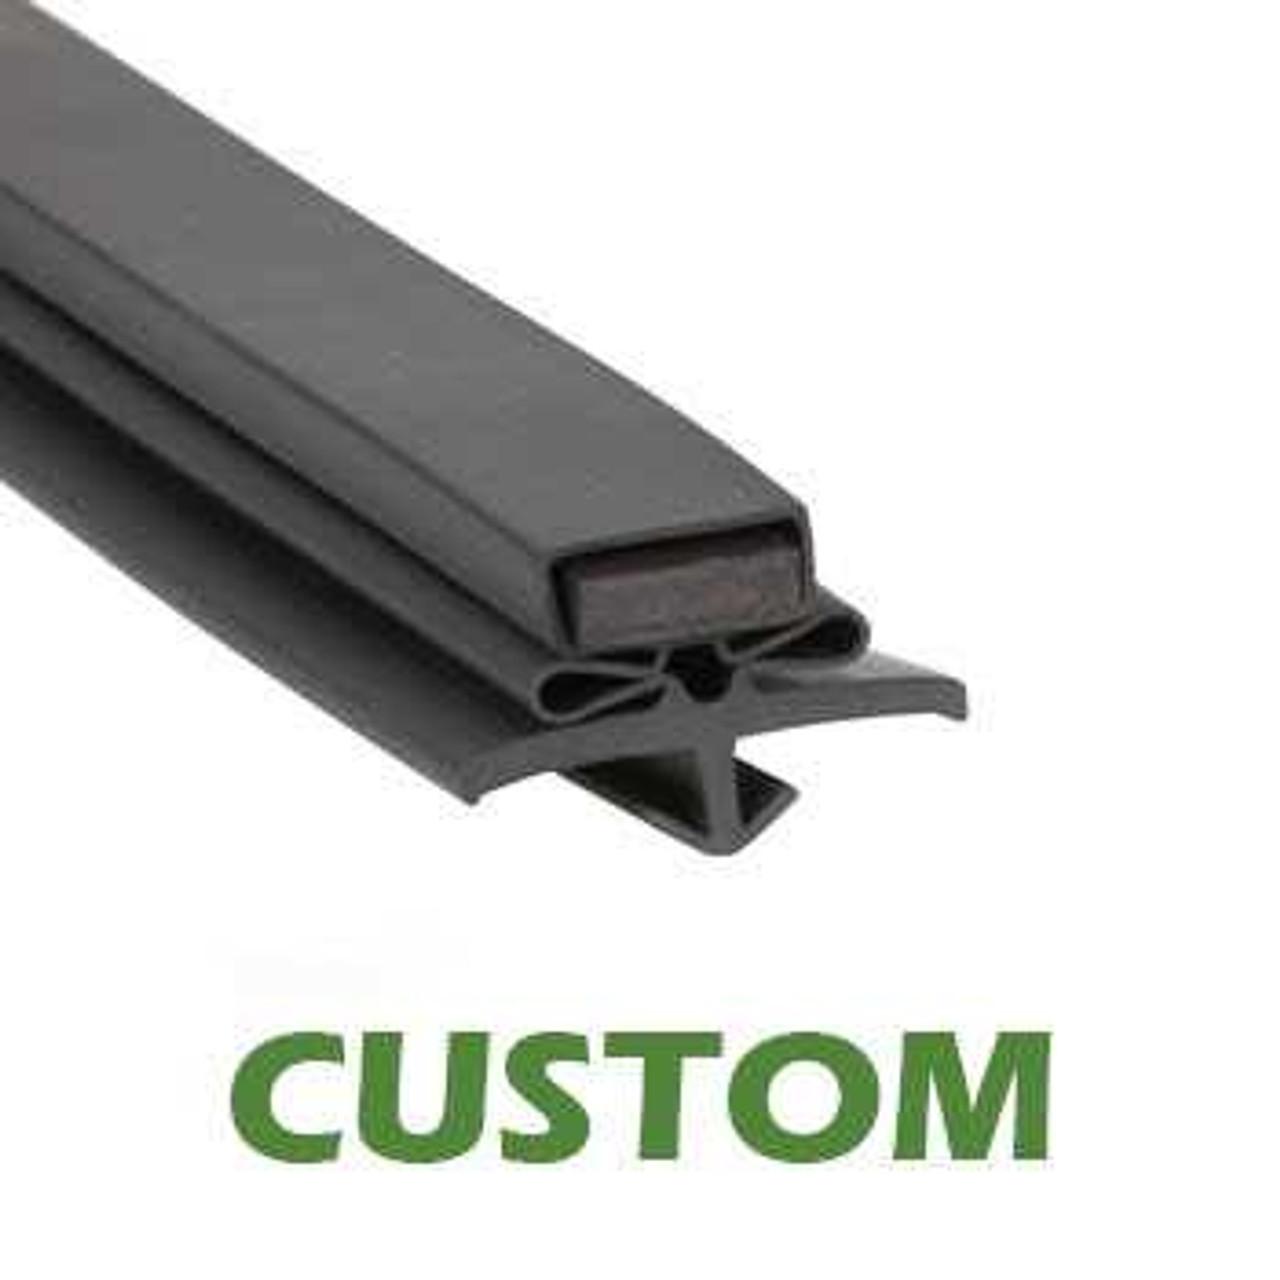 Profile 016 - Custom Refrigeration Gasket Custom Gaskets 0